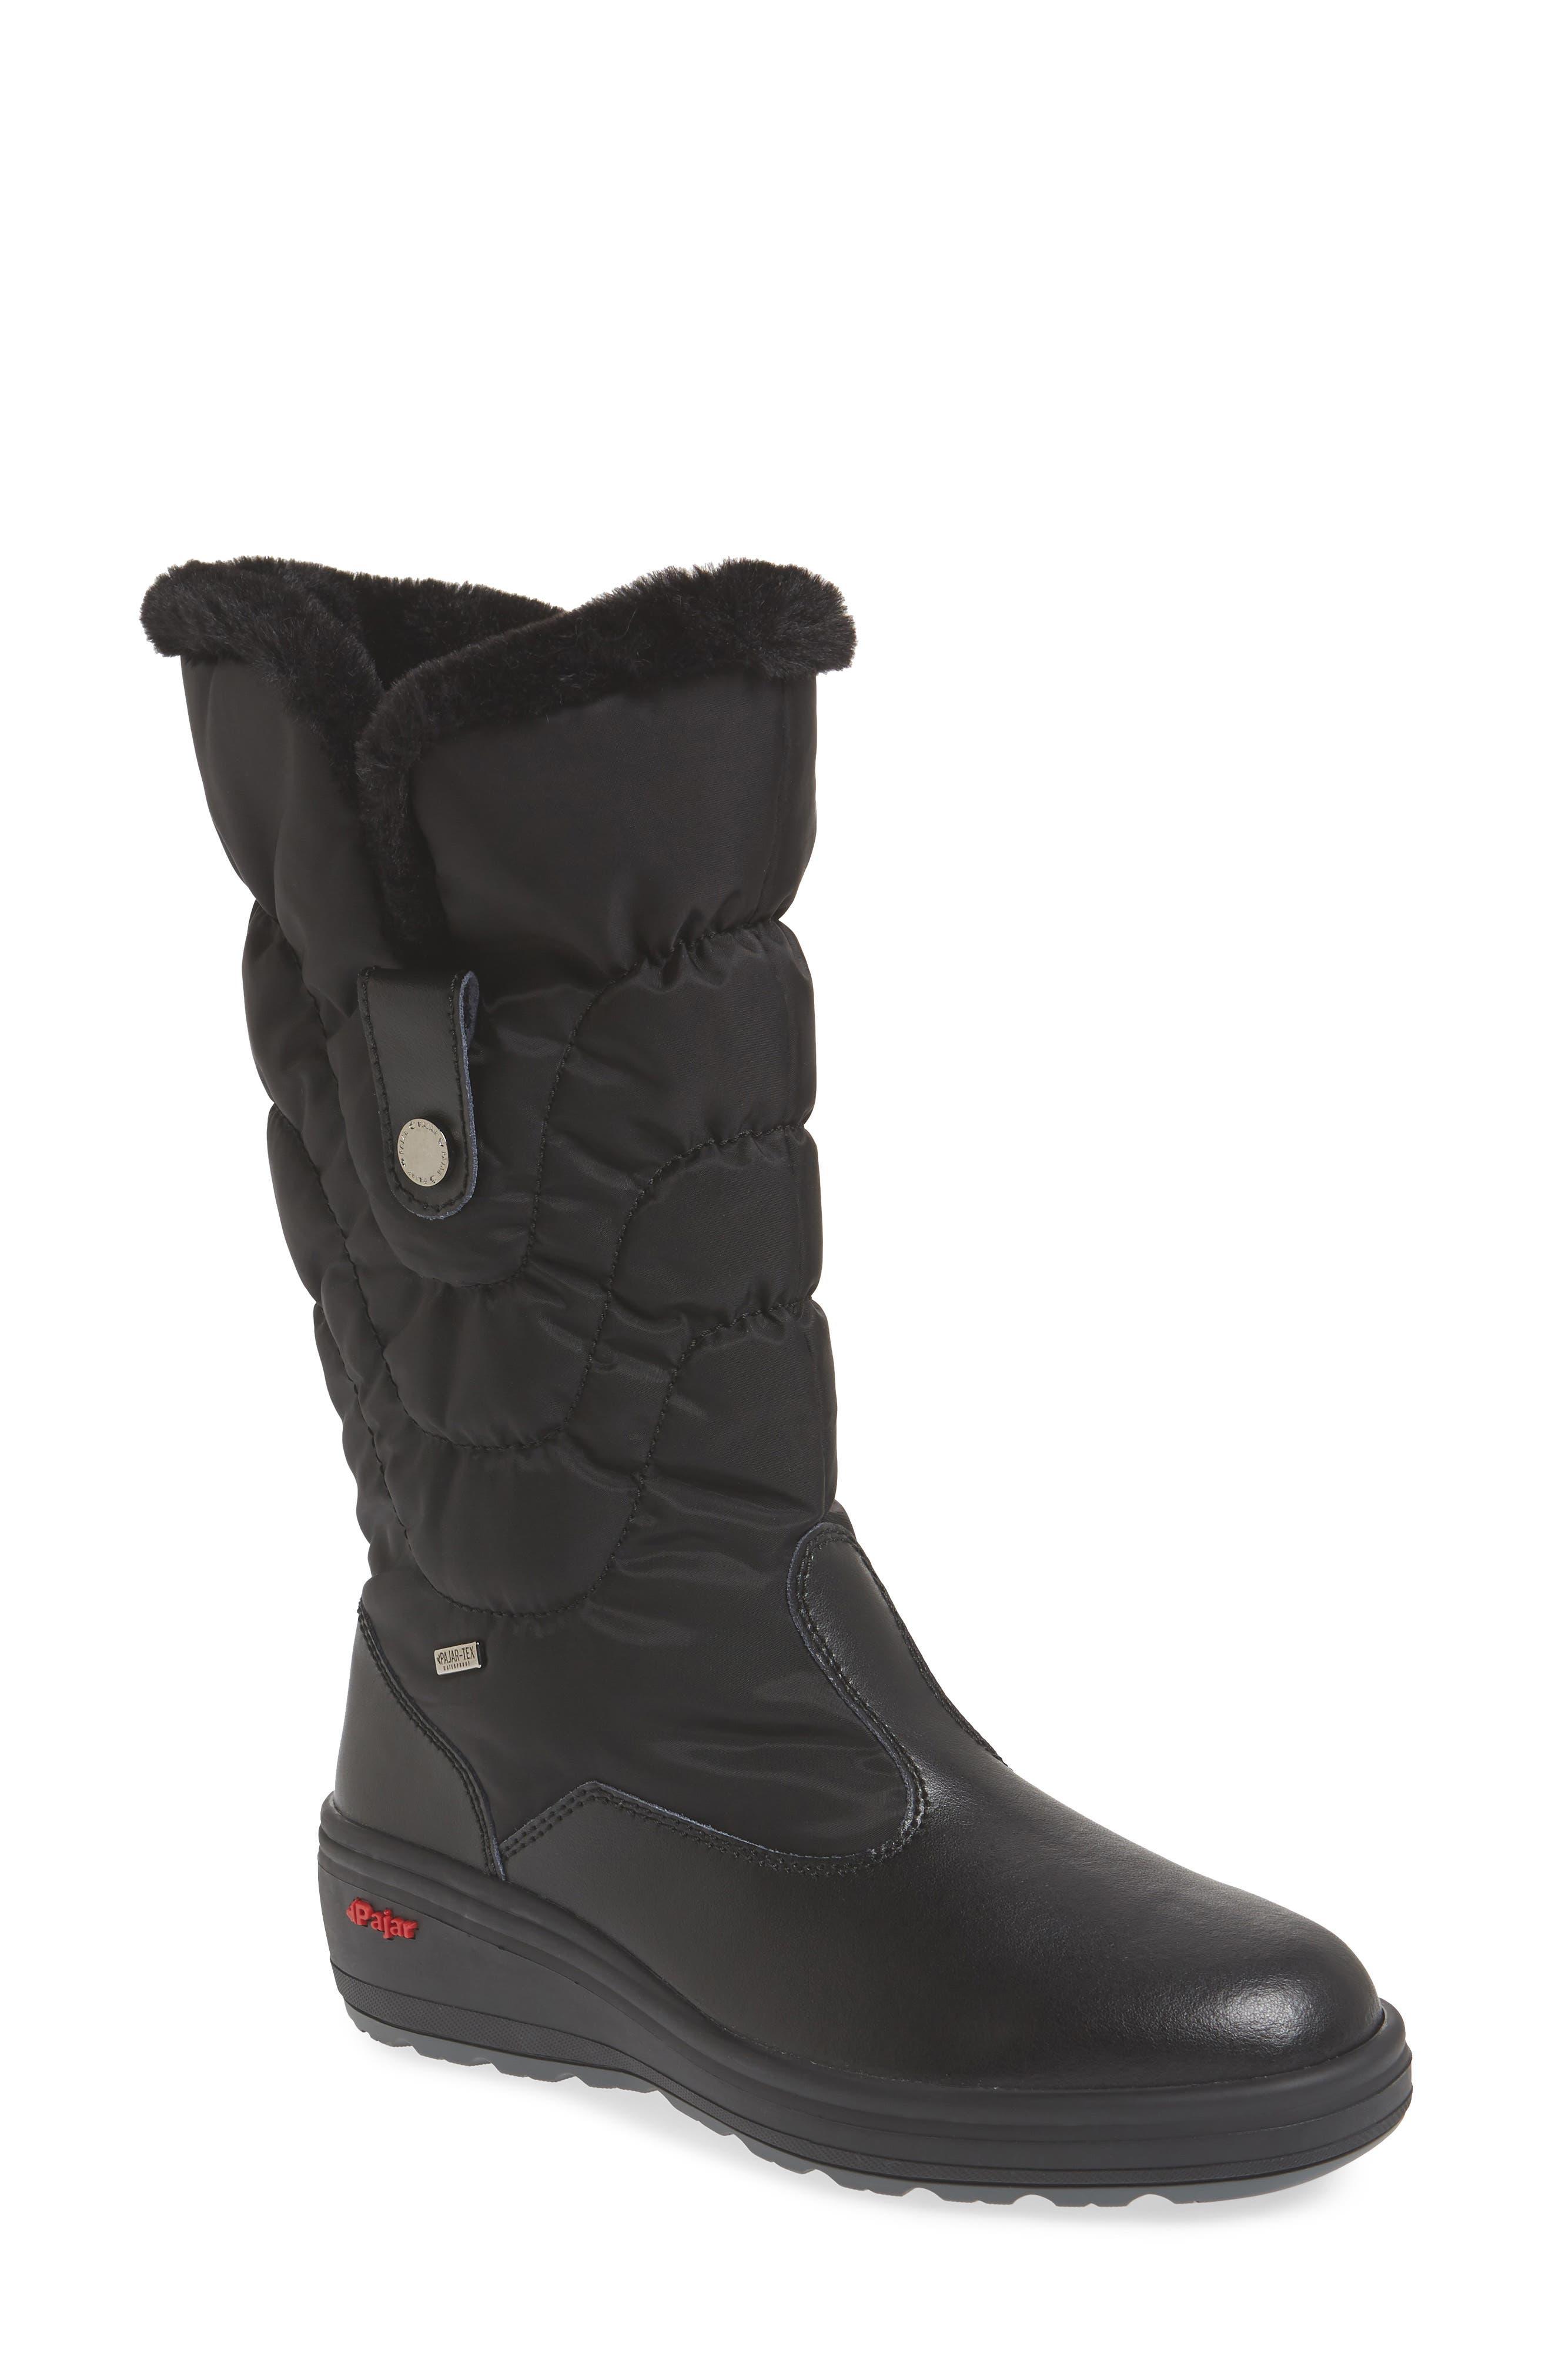 Pajar Waterproof Boot With Faux Fur Cuff, Black